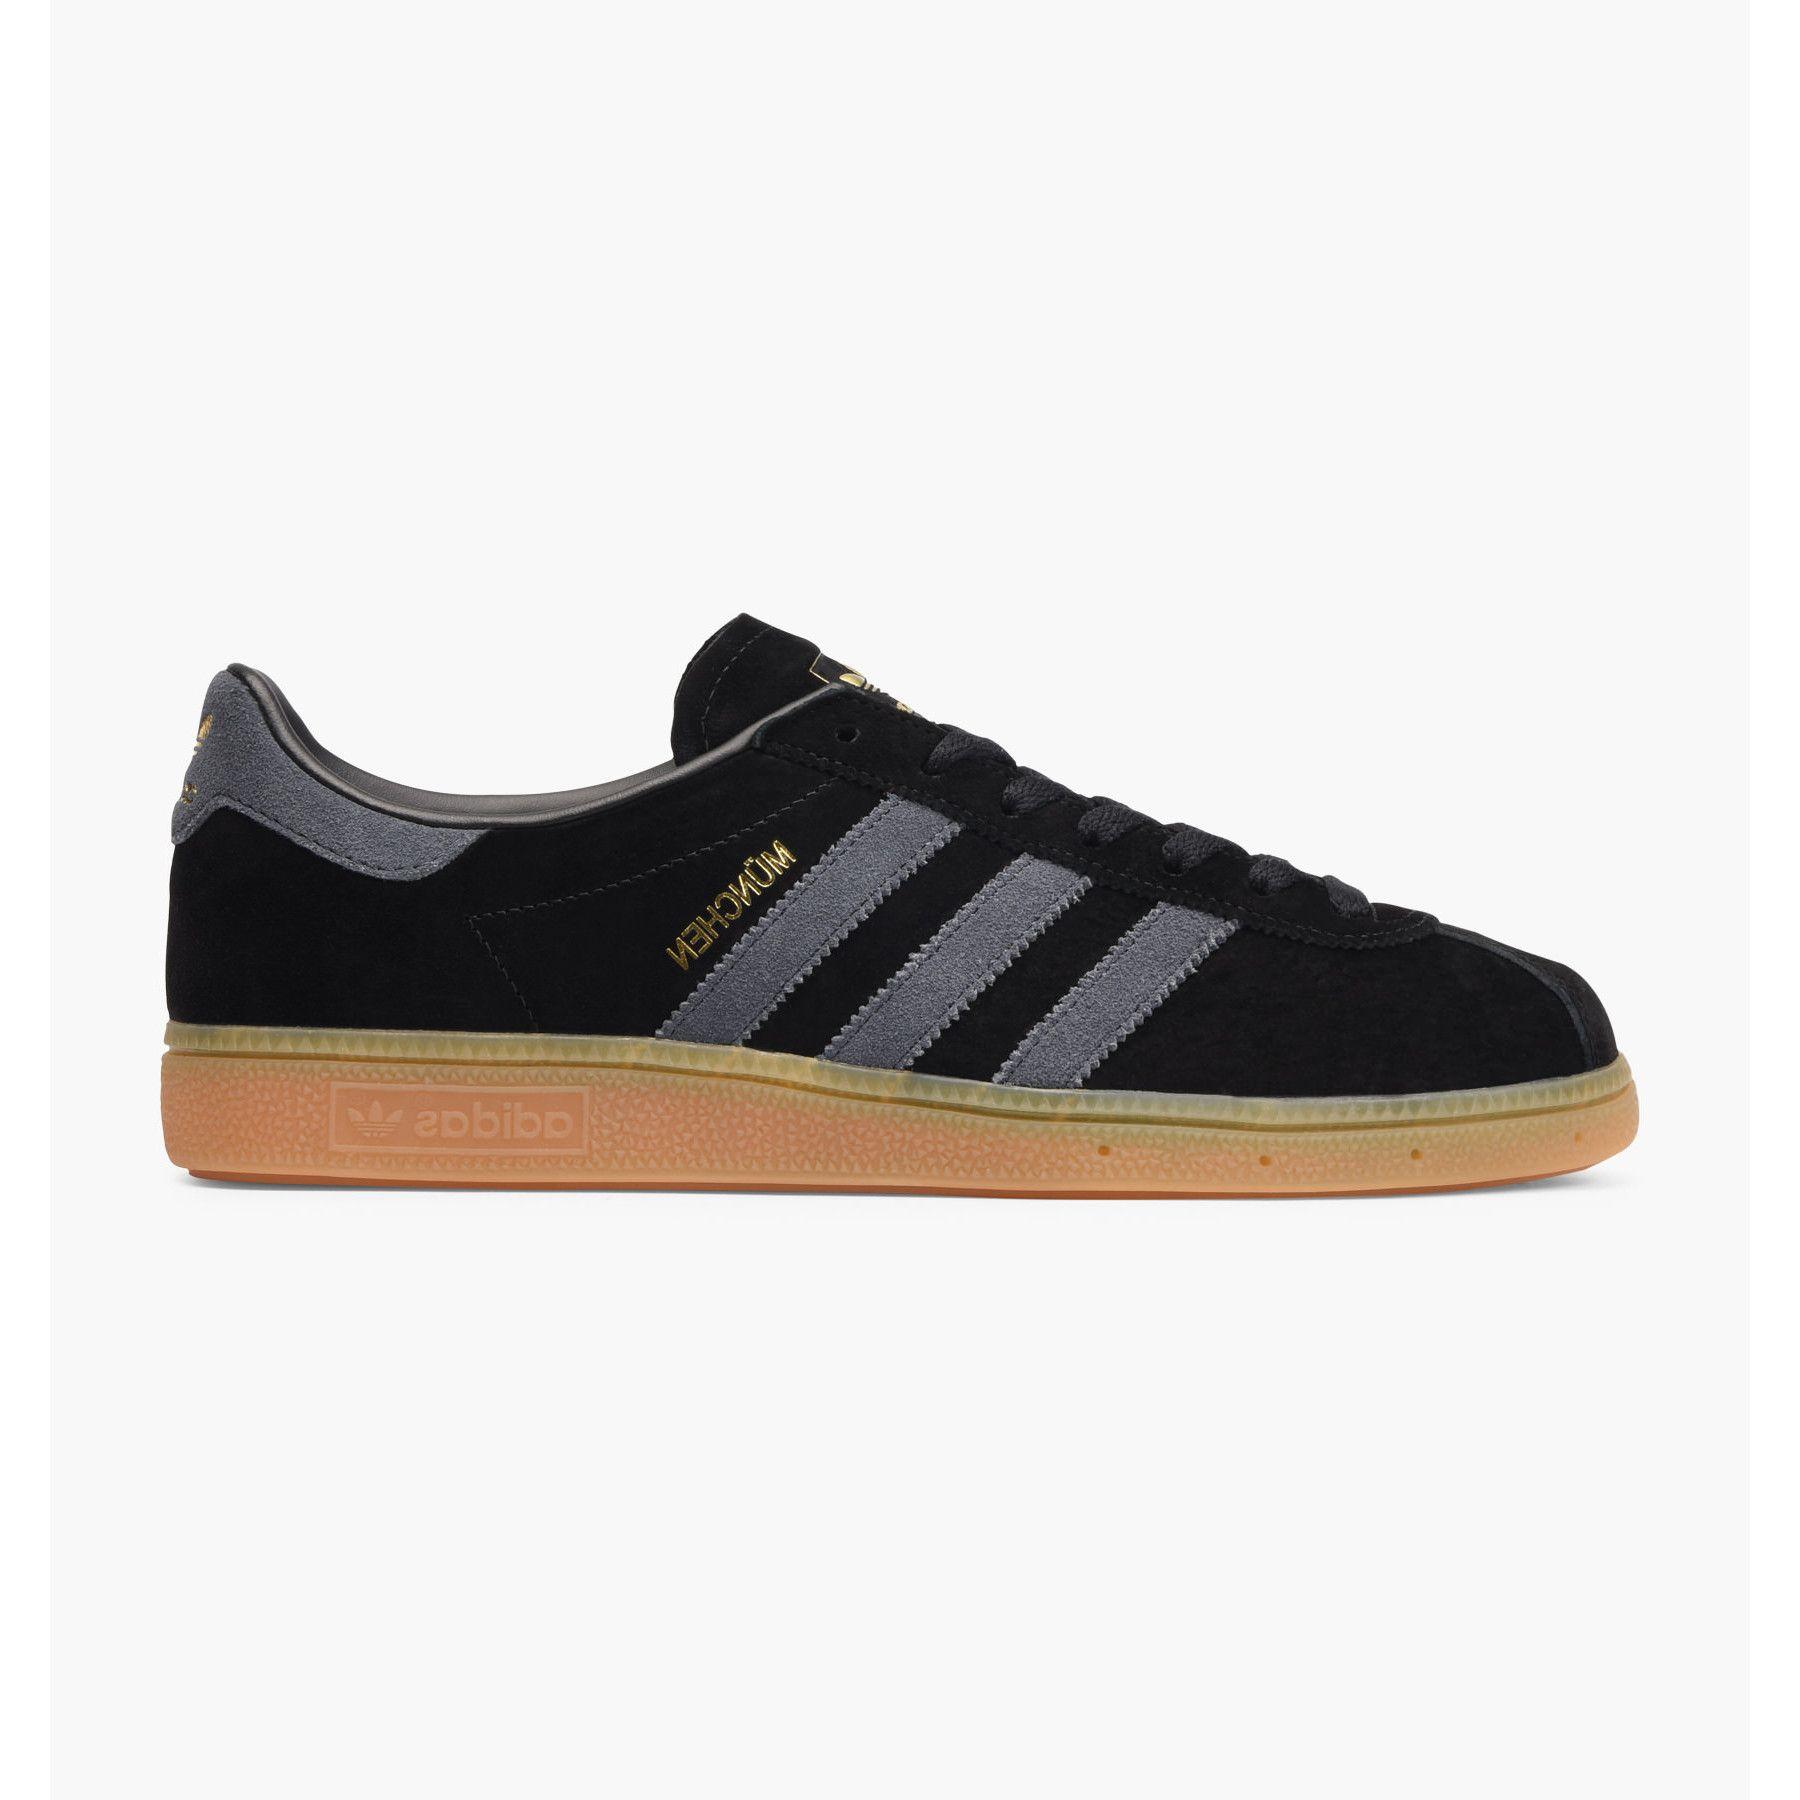 Pantofi Sport Adidas Munchen, Barbati, Negru BB5295 44 EU